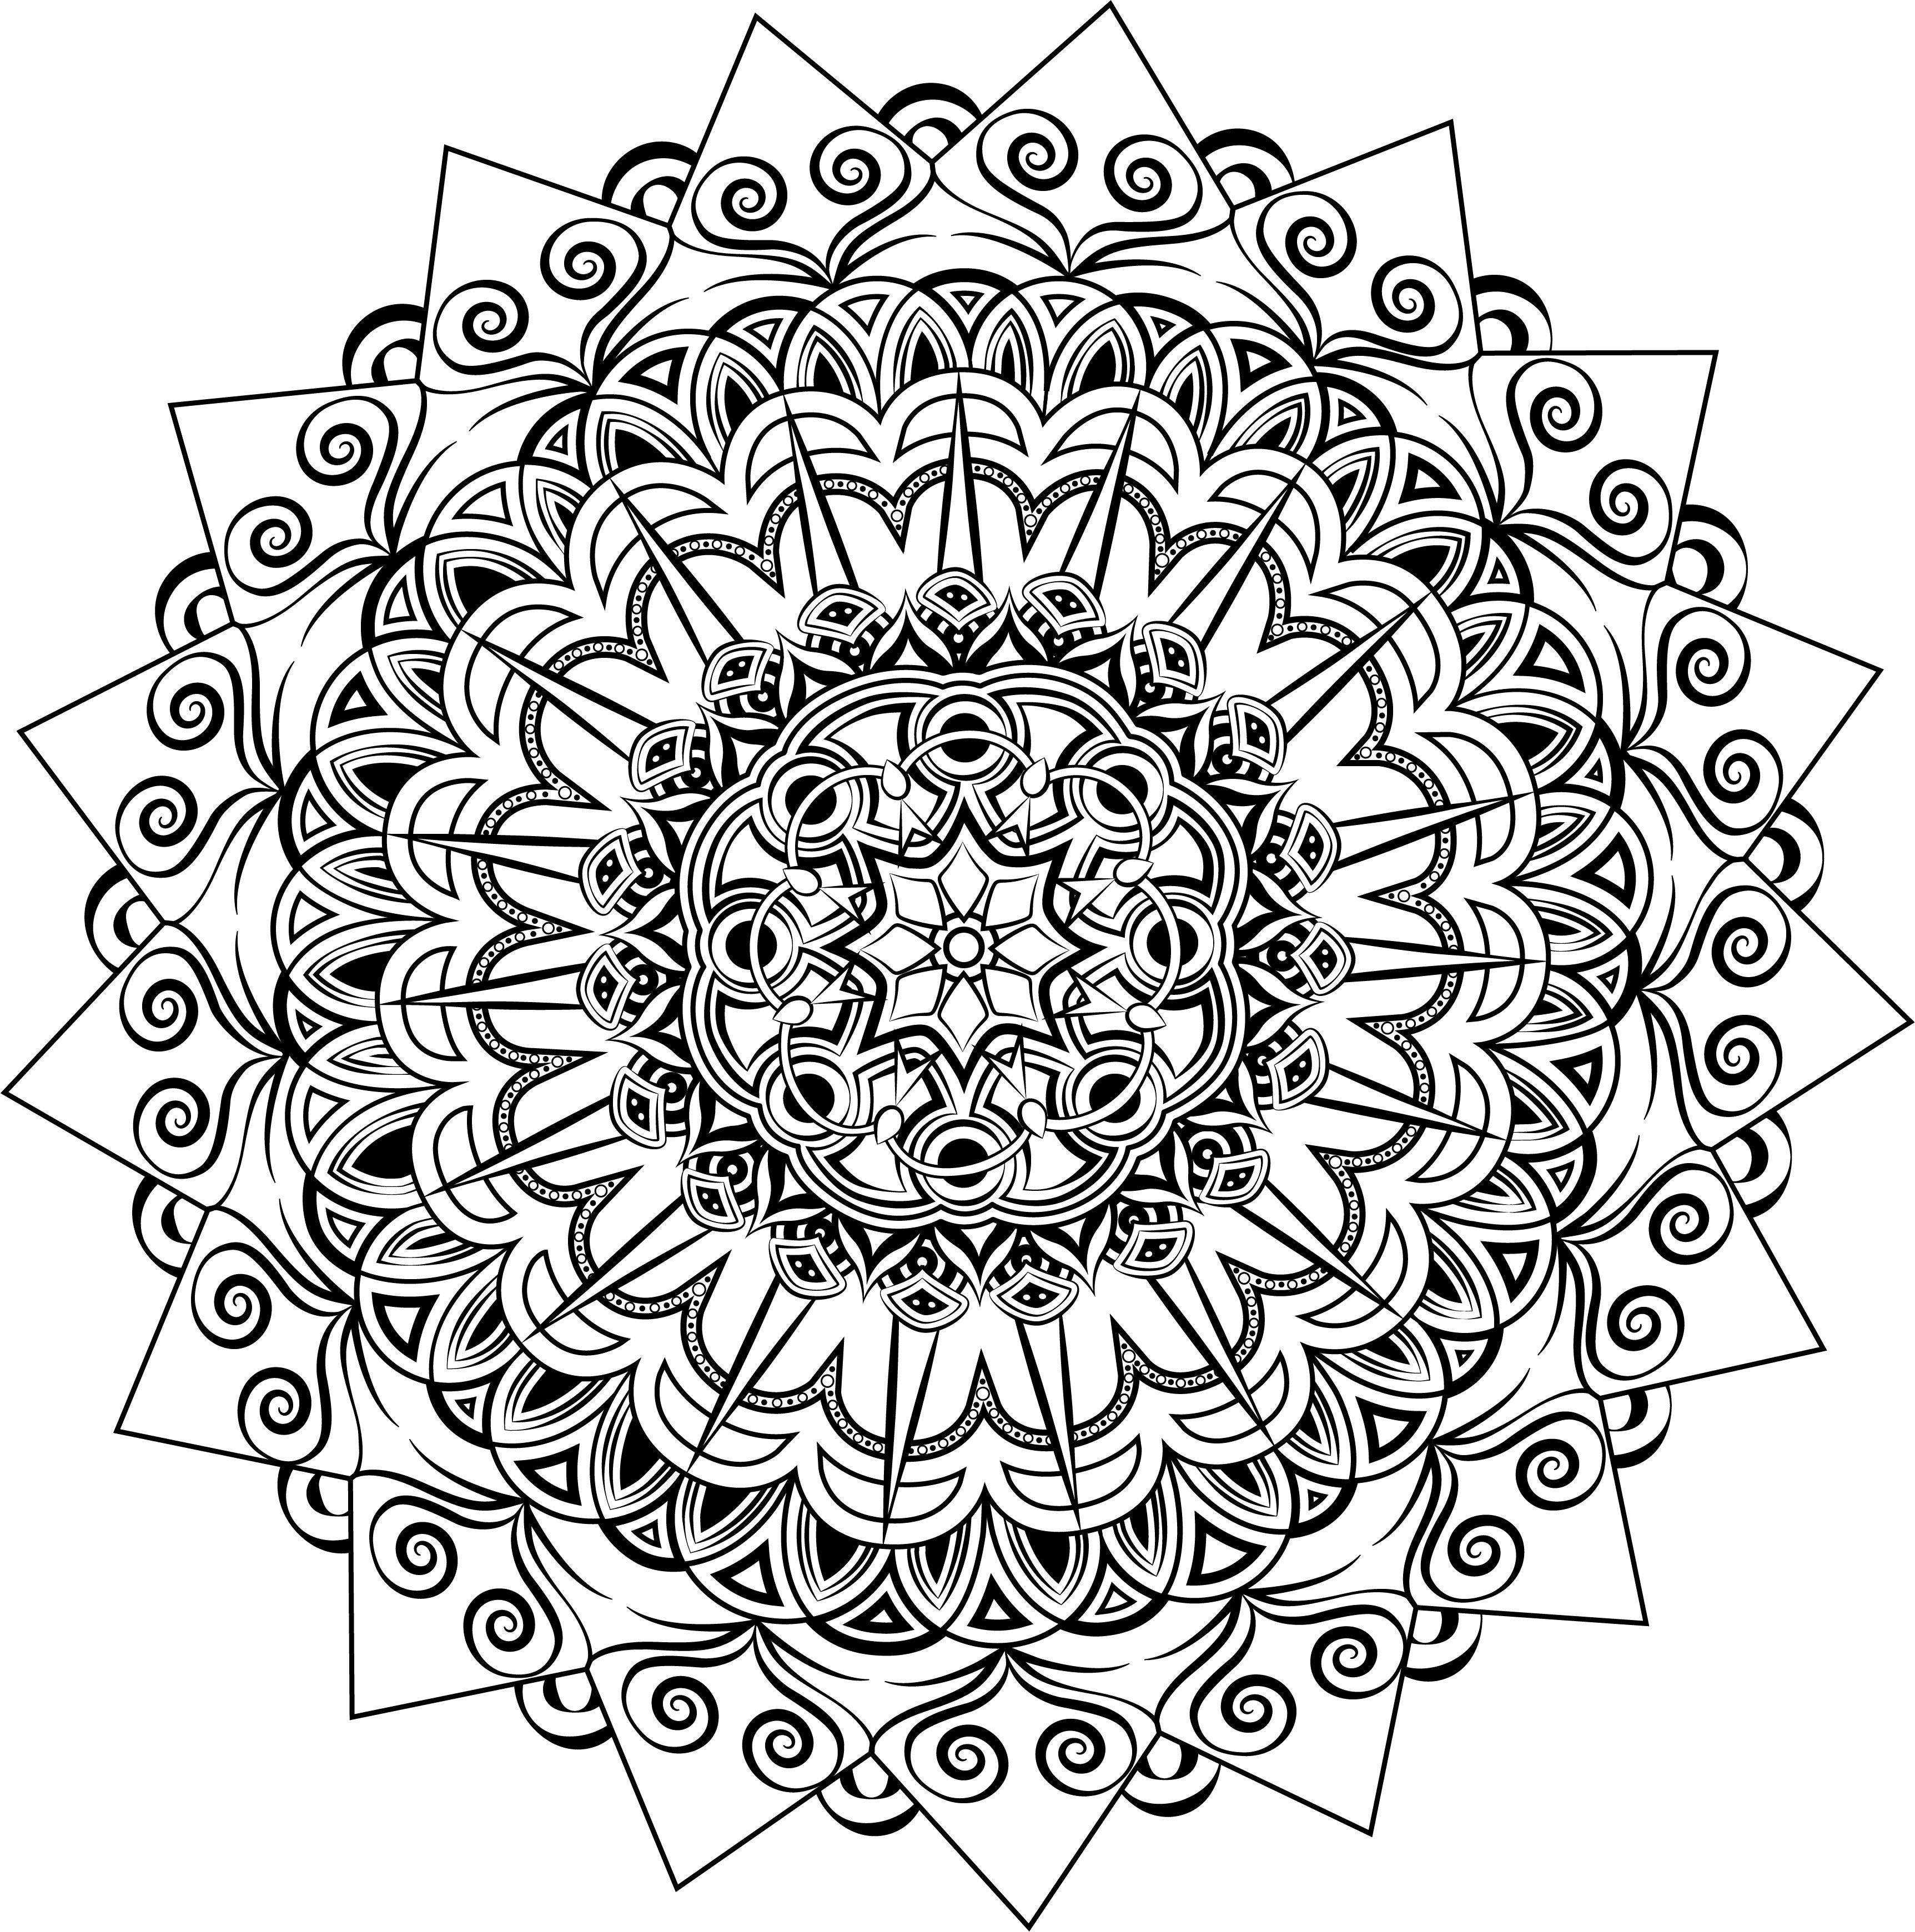 gunston coloring pages   Пин от пользователя Irina на доске Мандалы. Арт-терапия ...